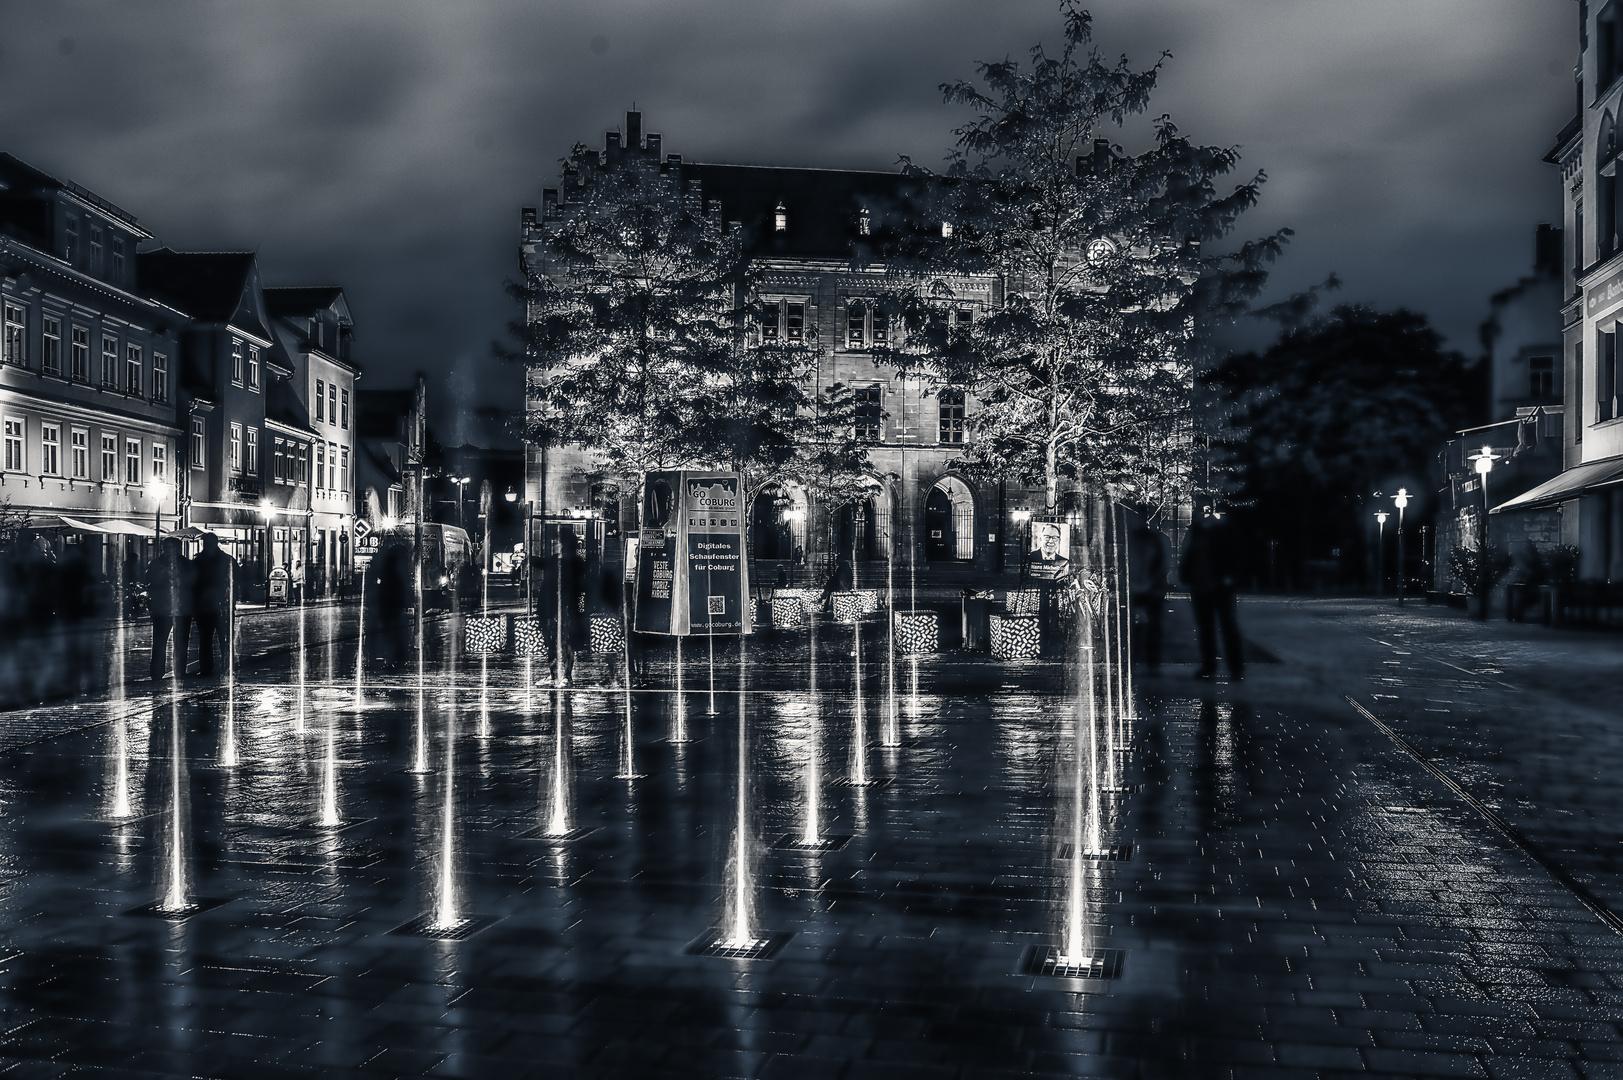 Albertsplatz